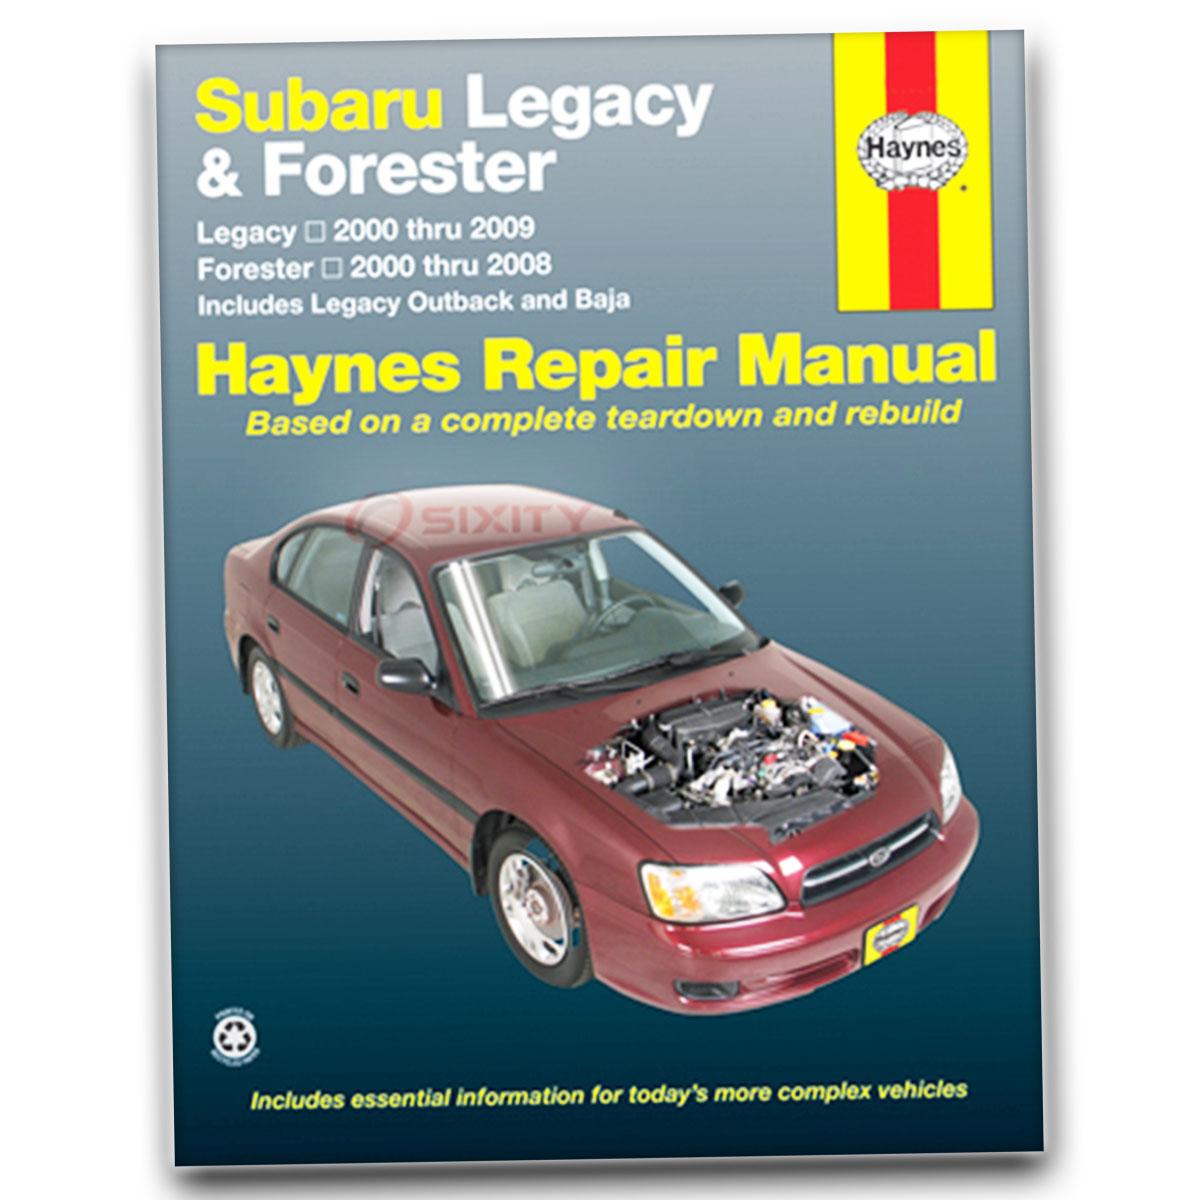 Haynes Repair Manual for Subaru Legacy GT spec.B L 35th Anniversary 2.5i sr